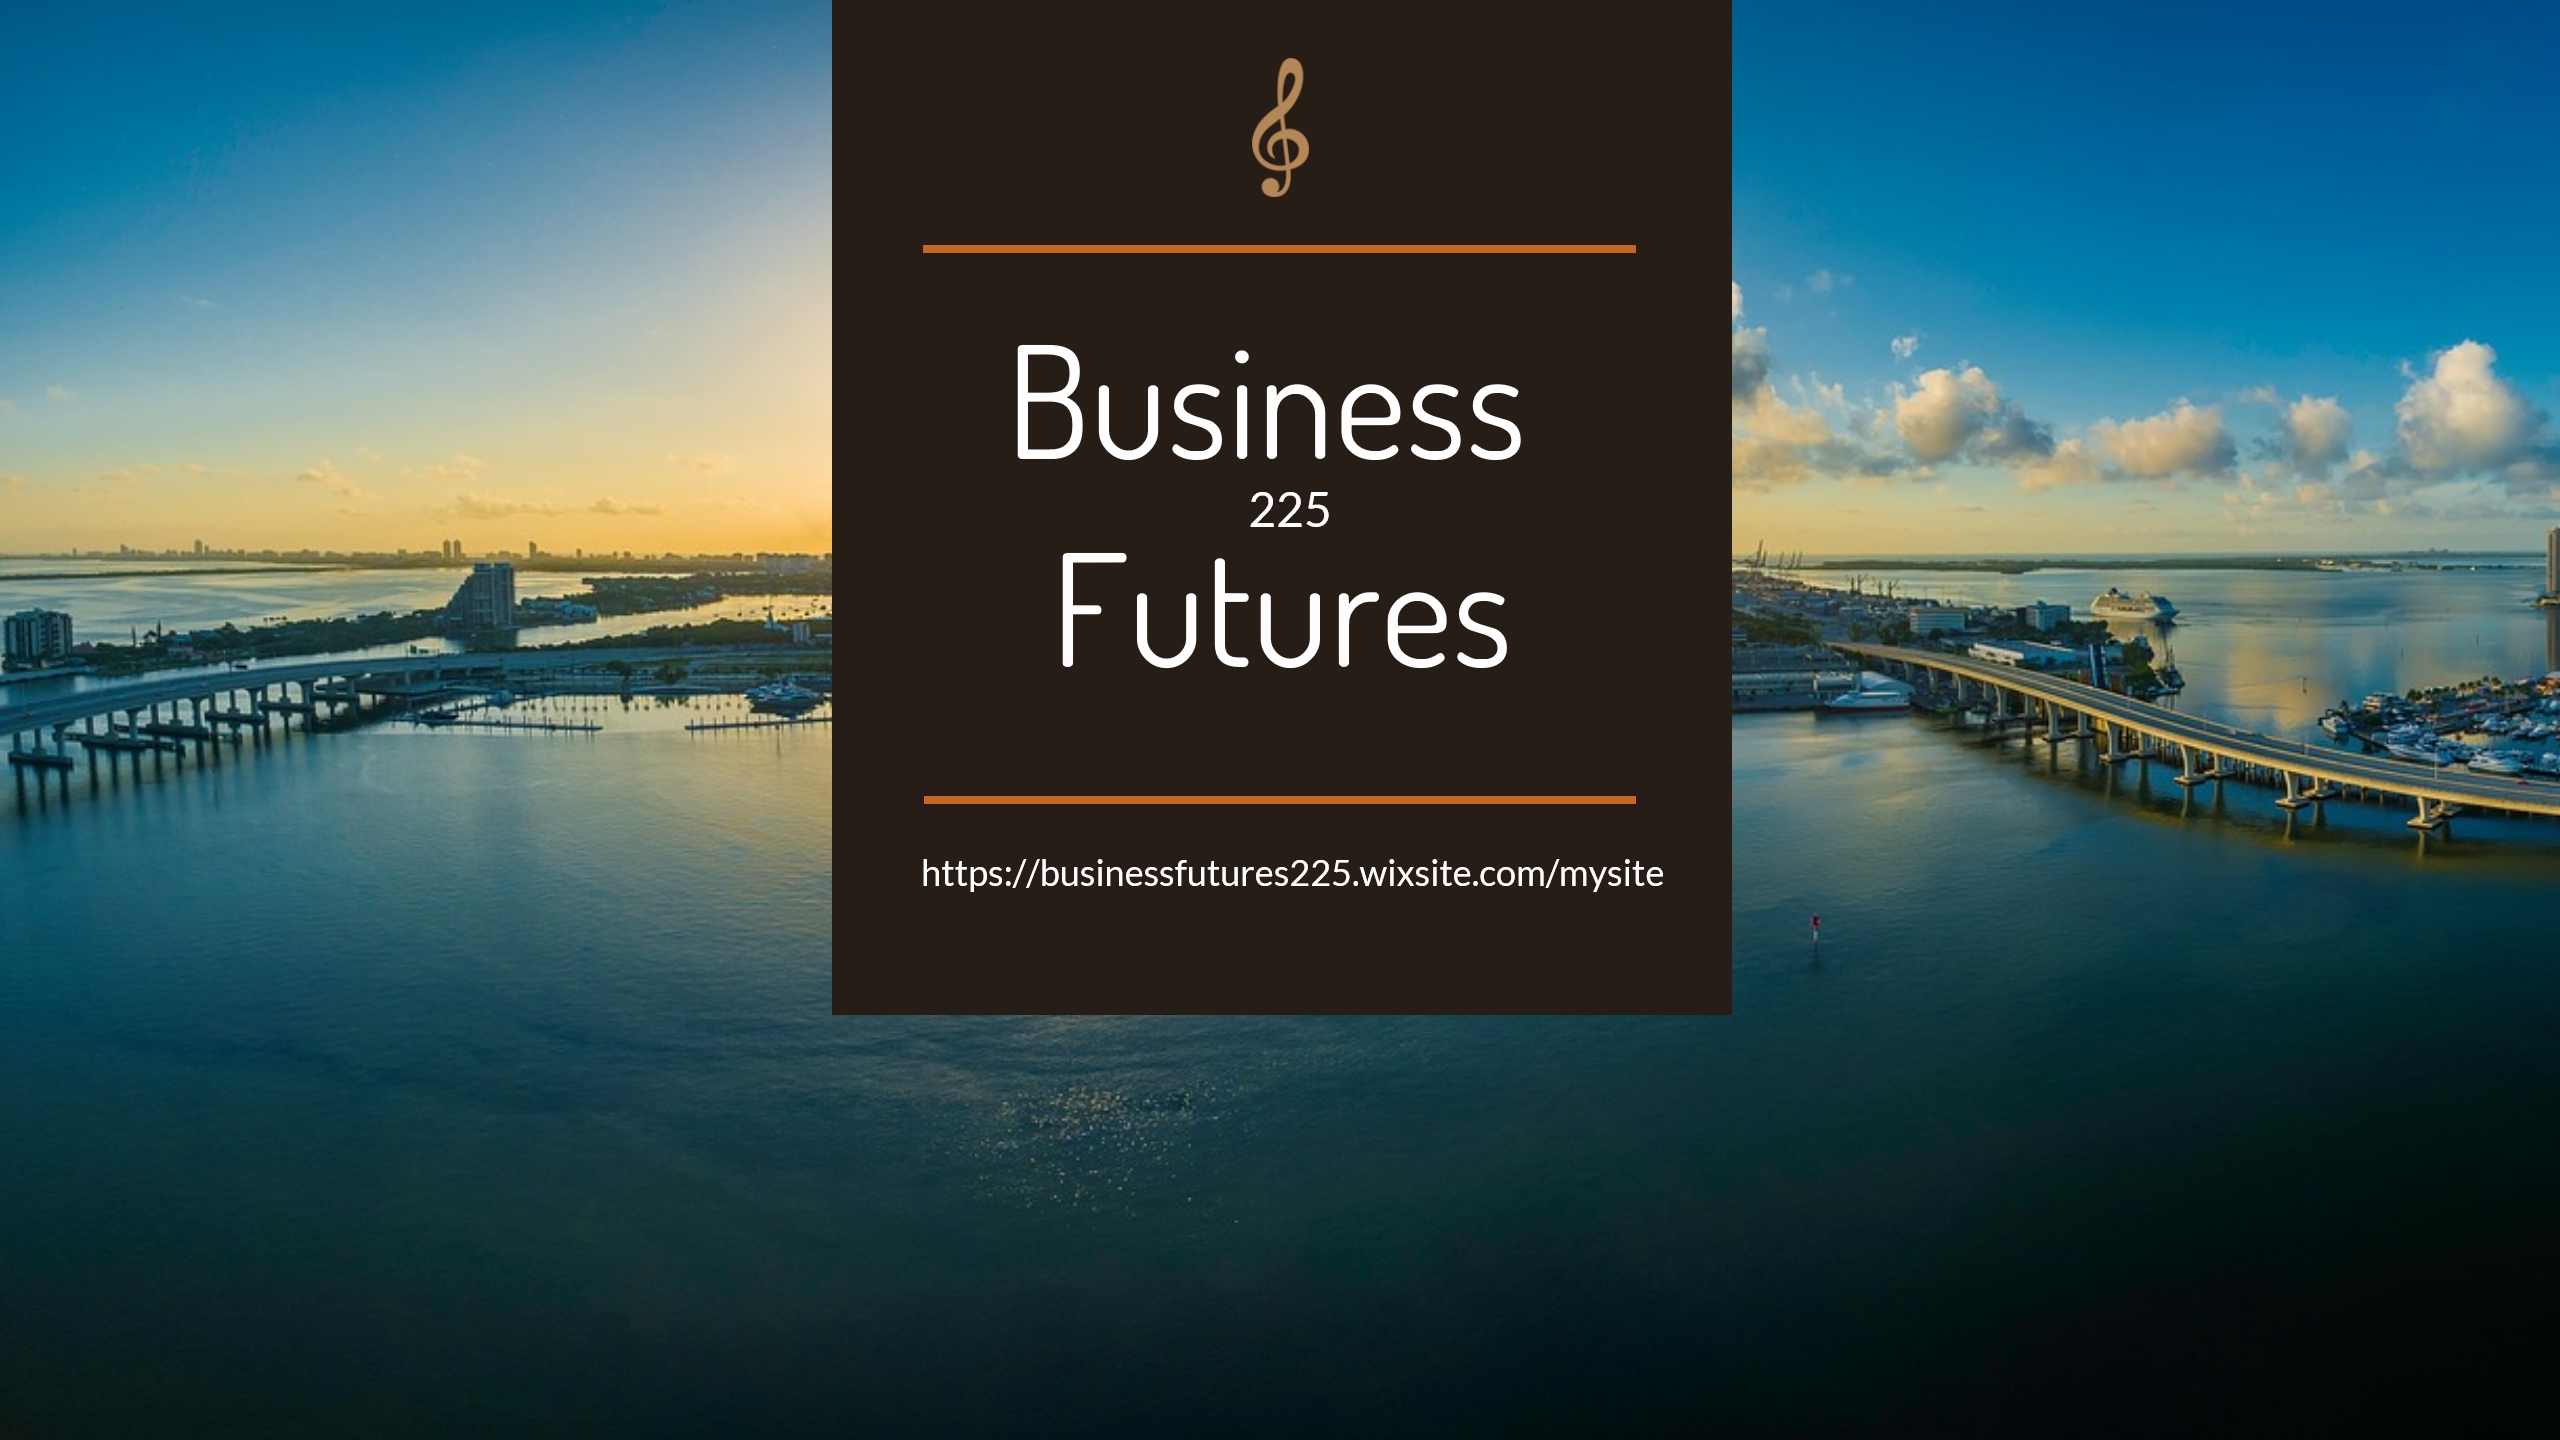 Businessfutures225 日経225先物 日経平均 名古屋